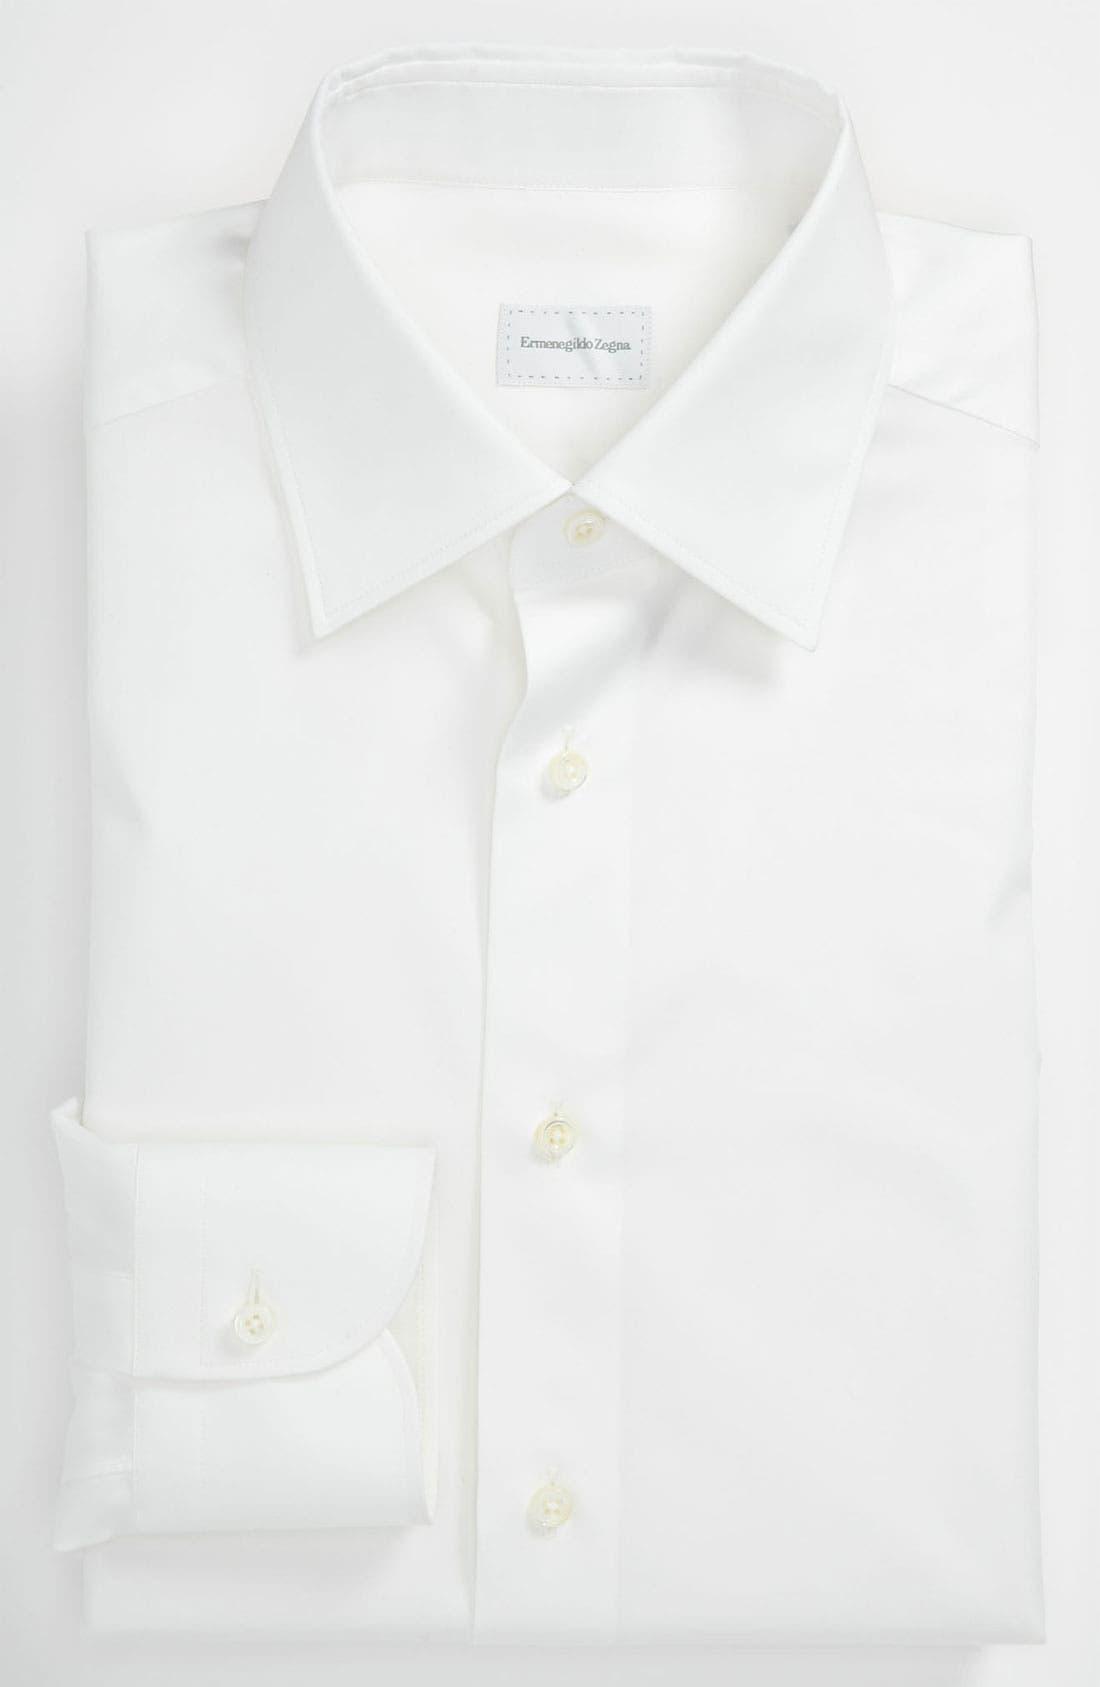 Main Image - Ermenegildo Zegna Regular Fit Dress Shirt